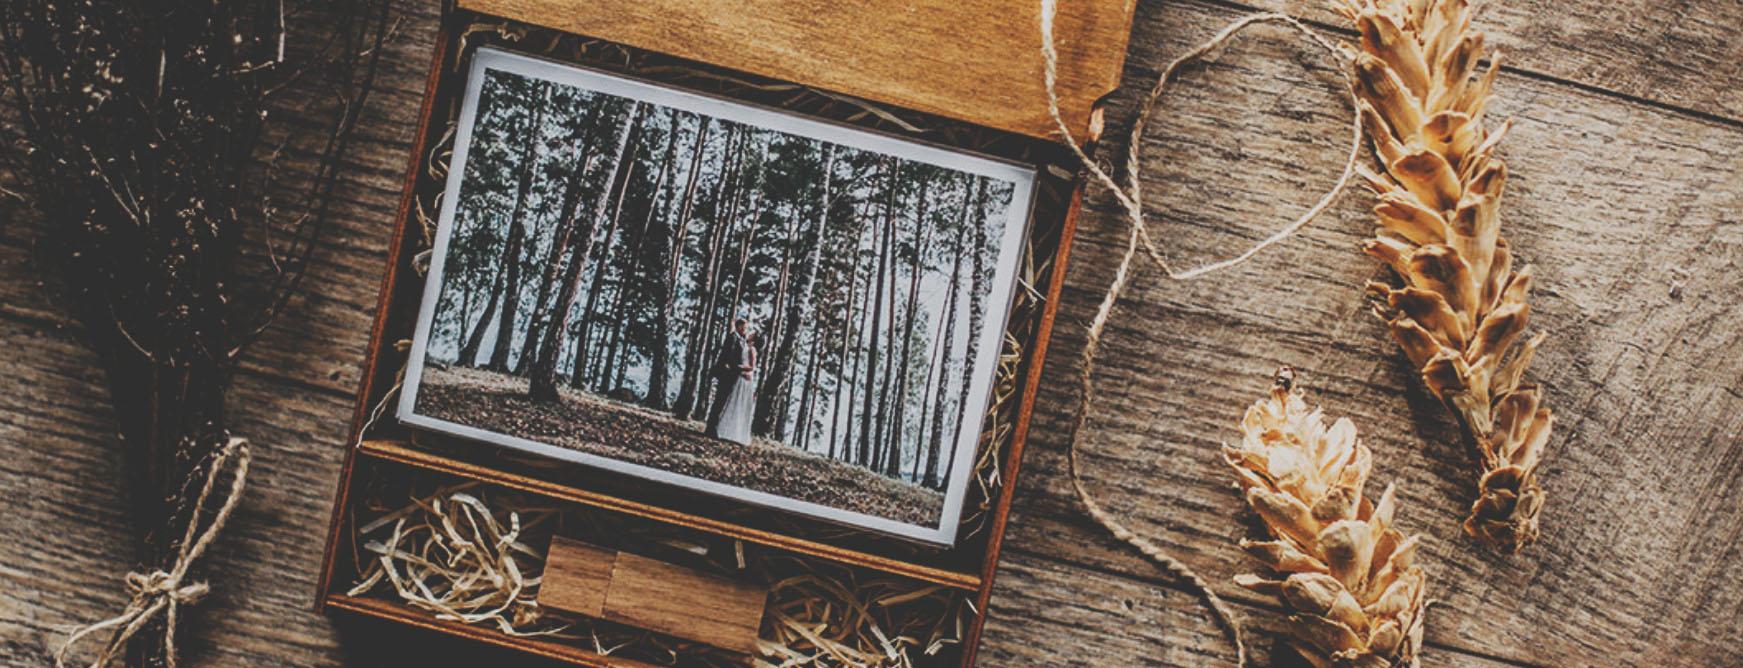 fotobox-holzkiste-bestellen-foto-box